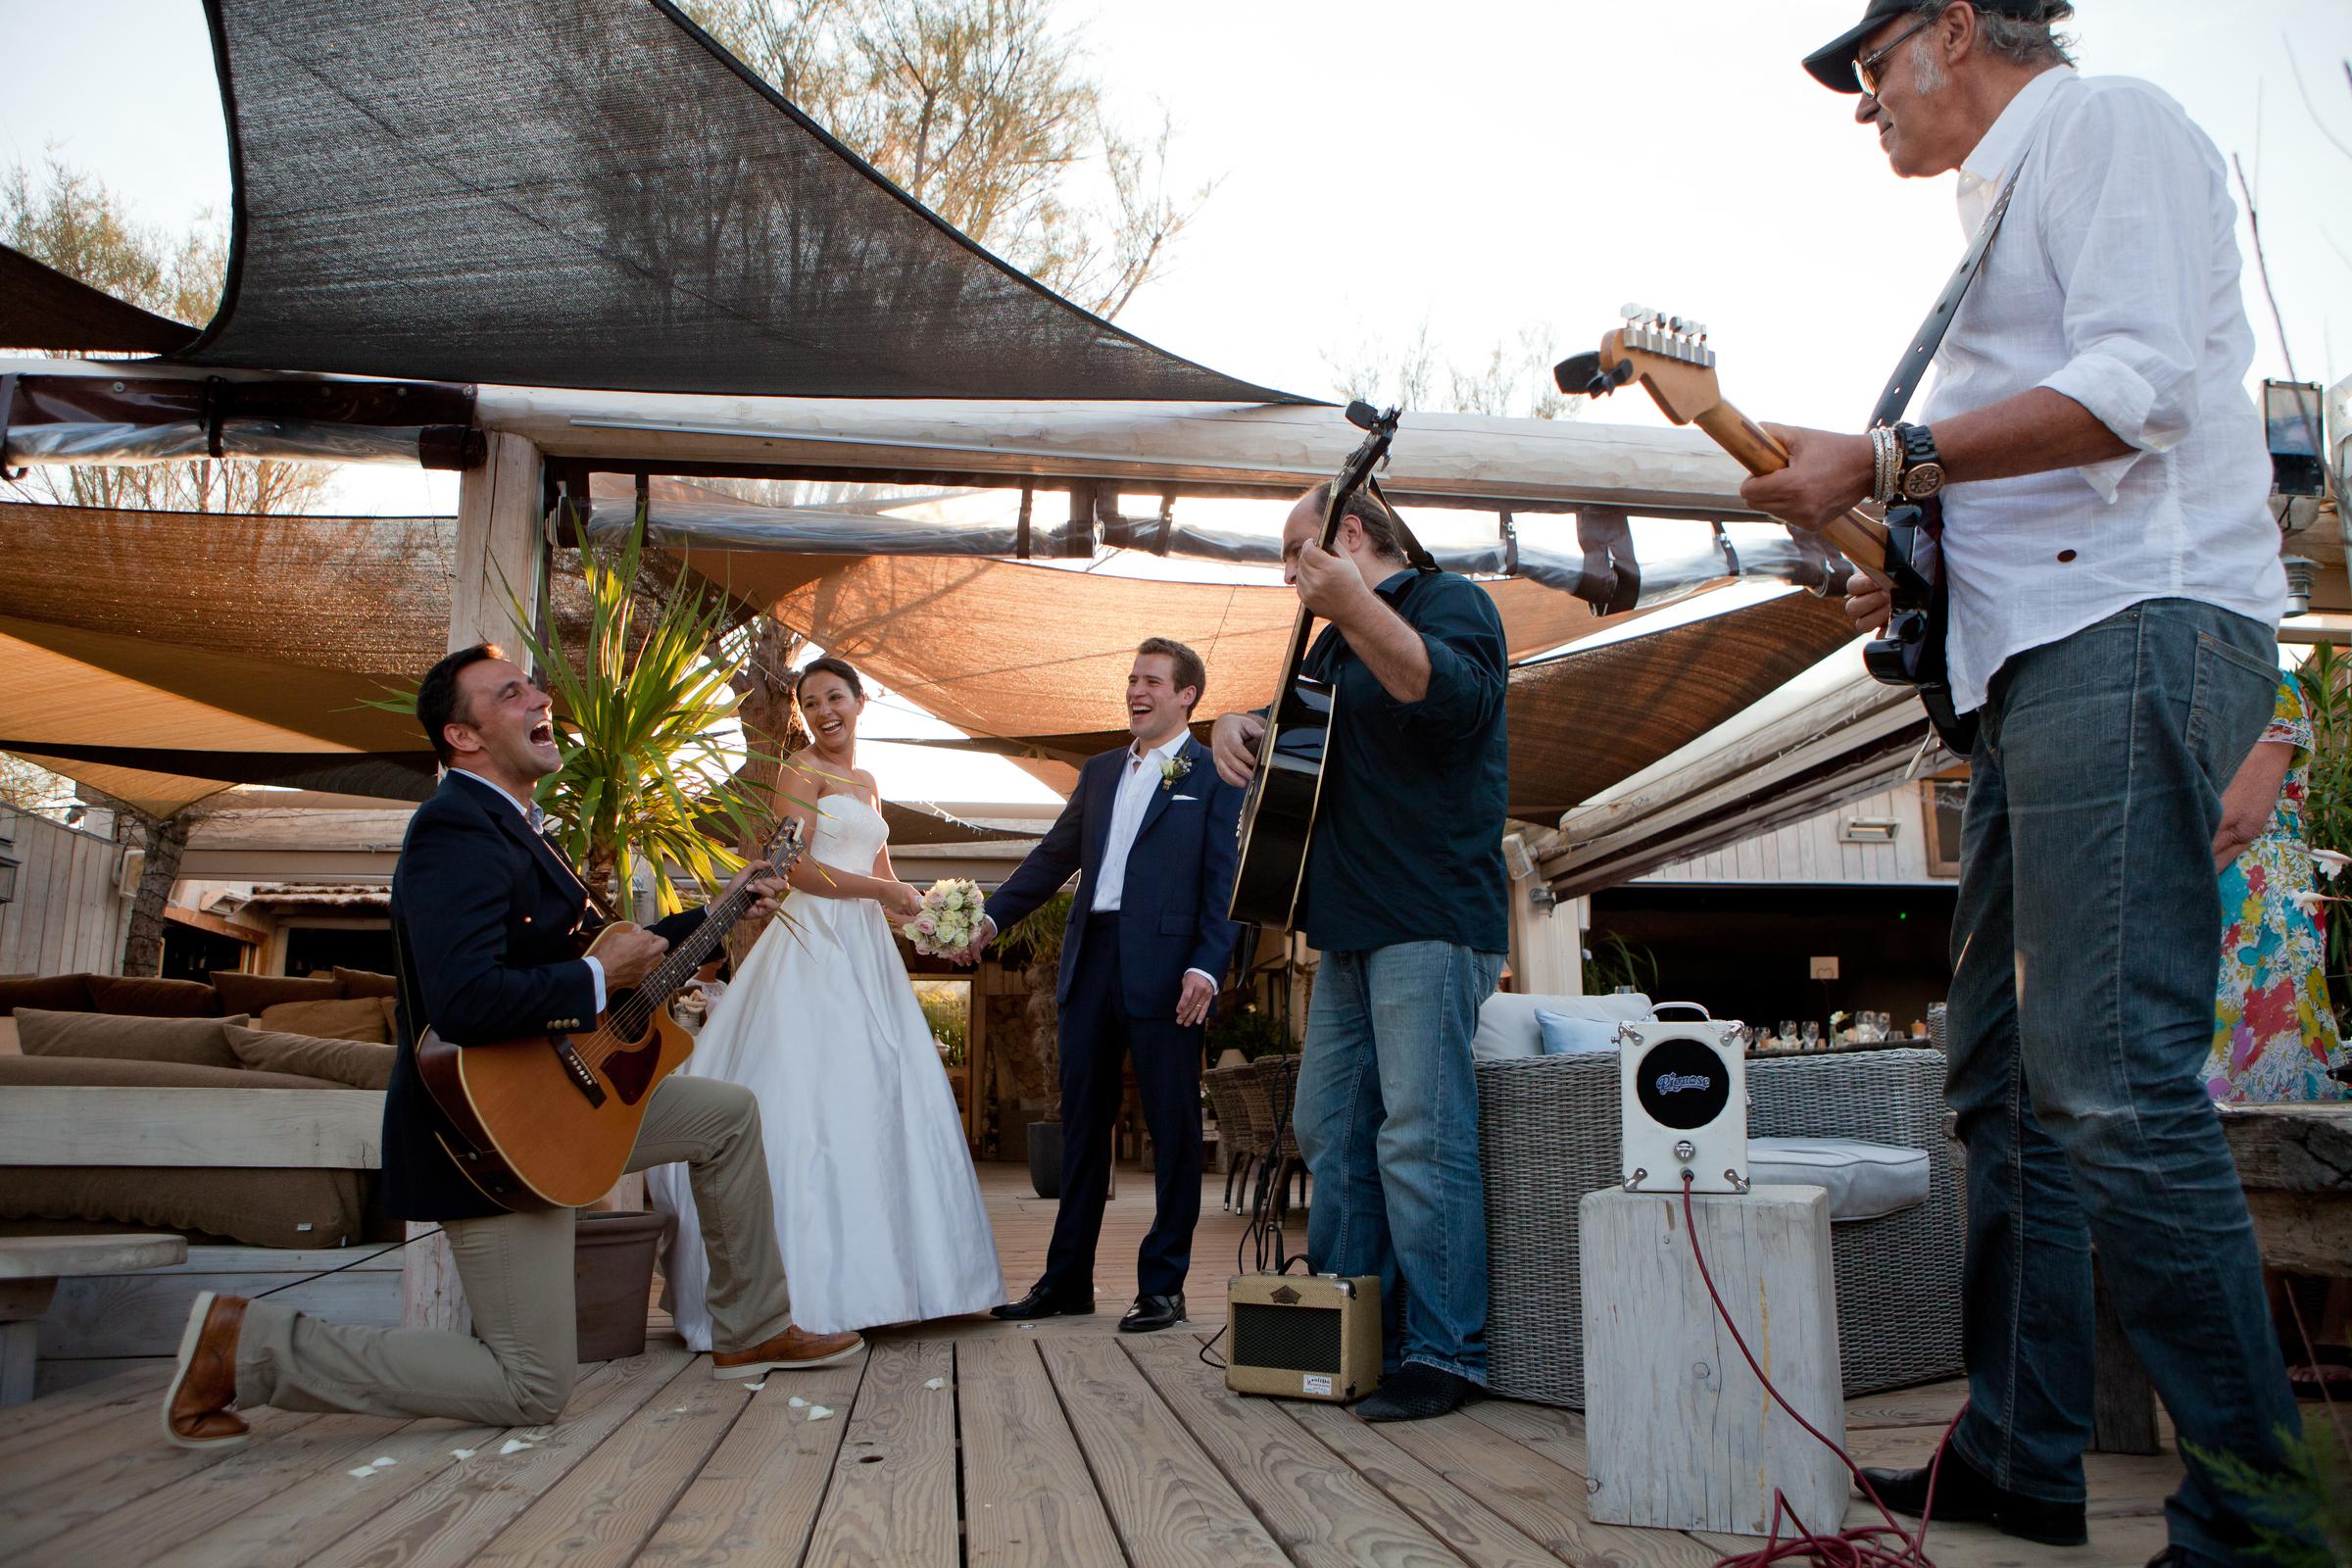 Wedding band, Cote d'Azur